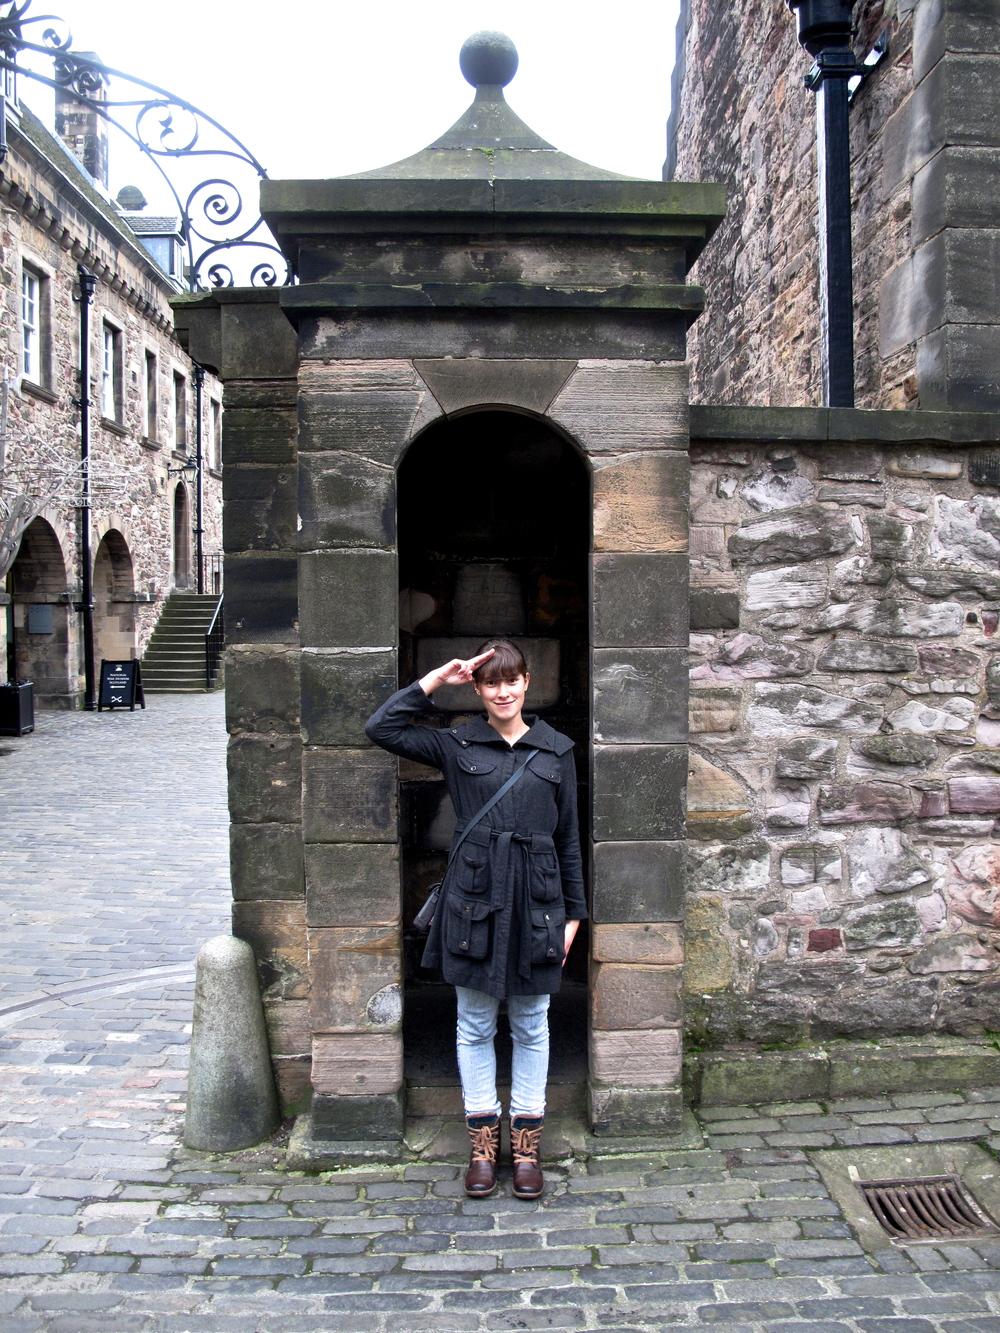 Saluting like a guard at Edinburgh Castle